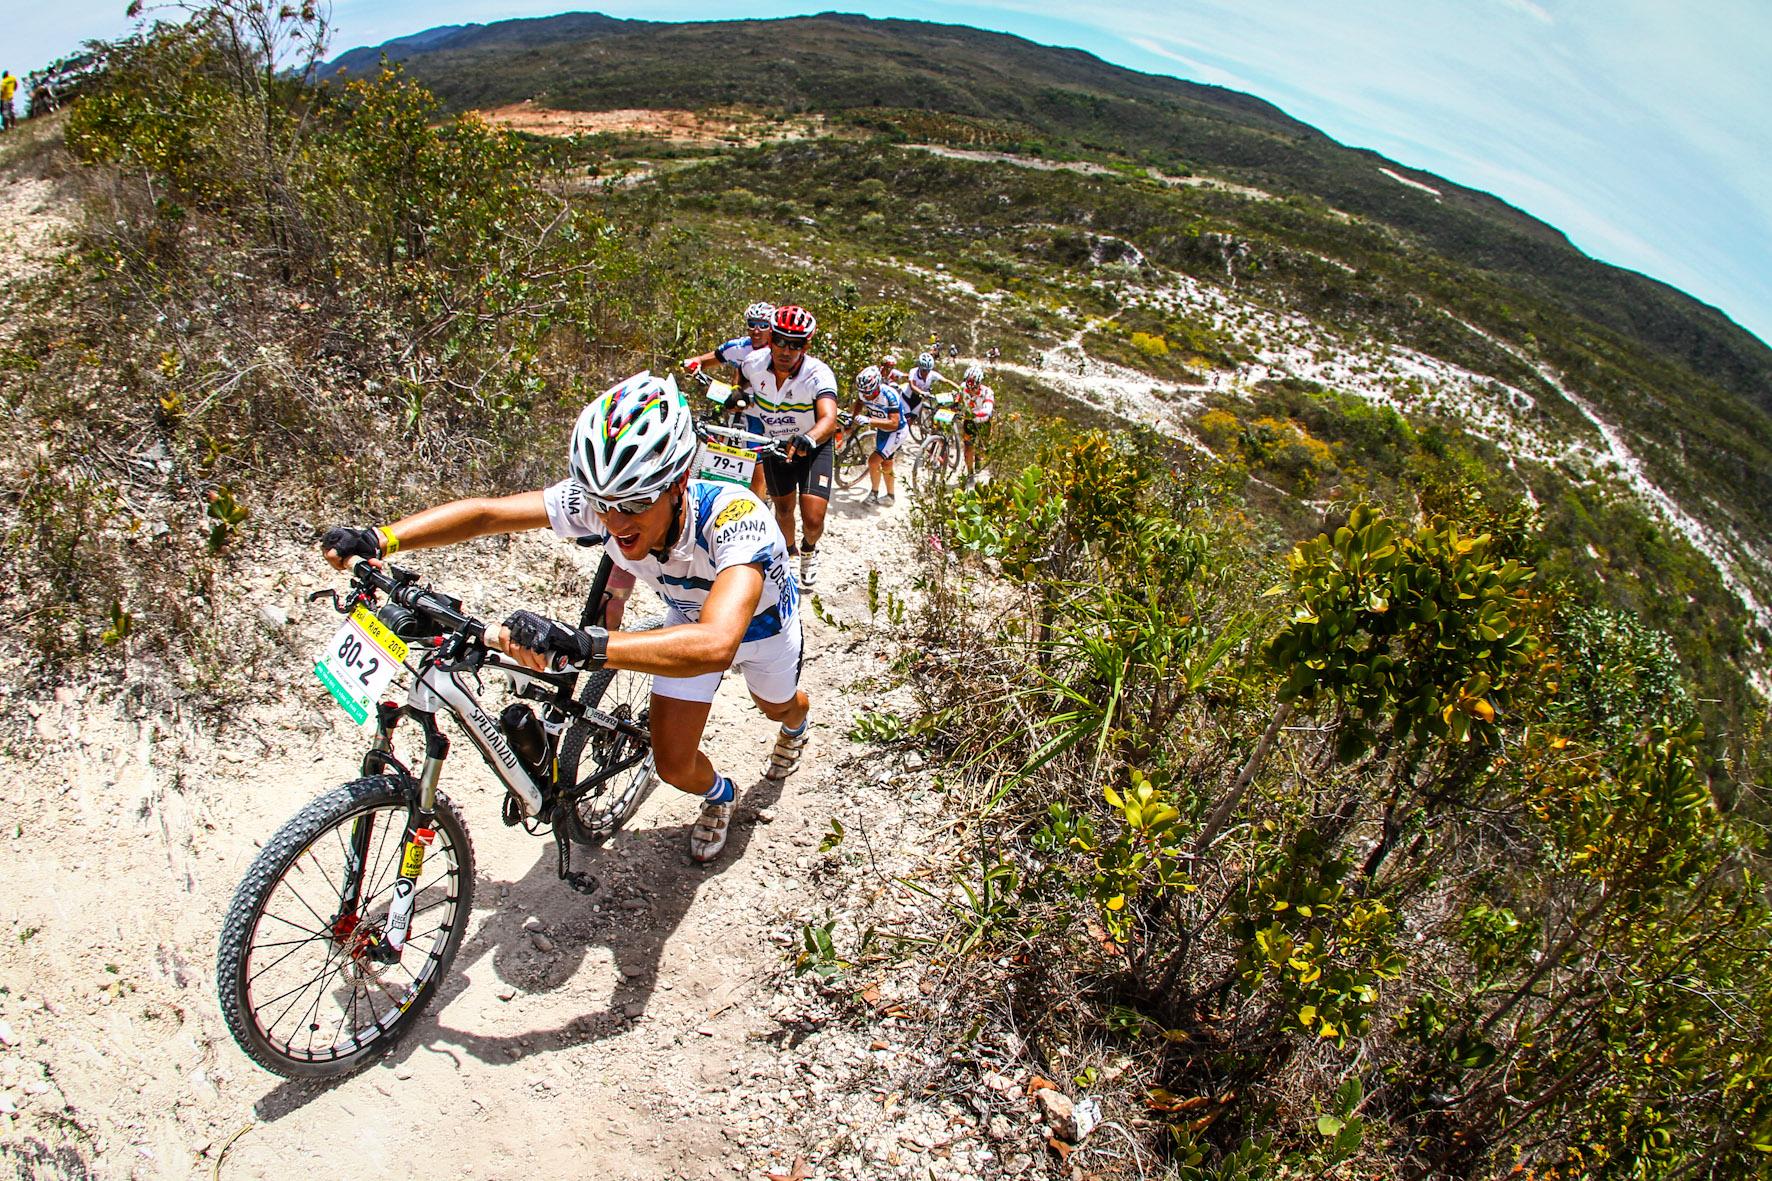 Brasil Ride Fuente: www.espiritooutdoor.com